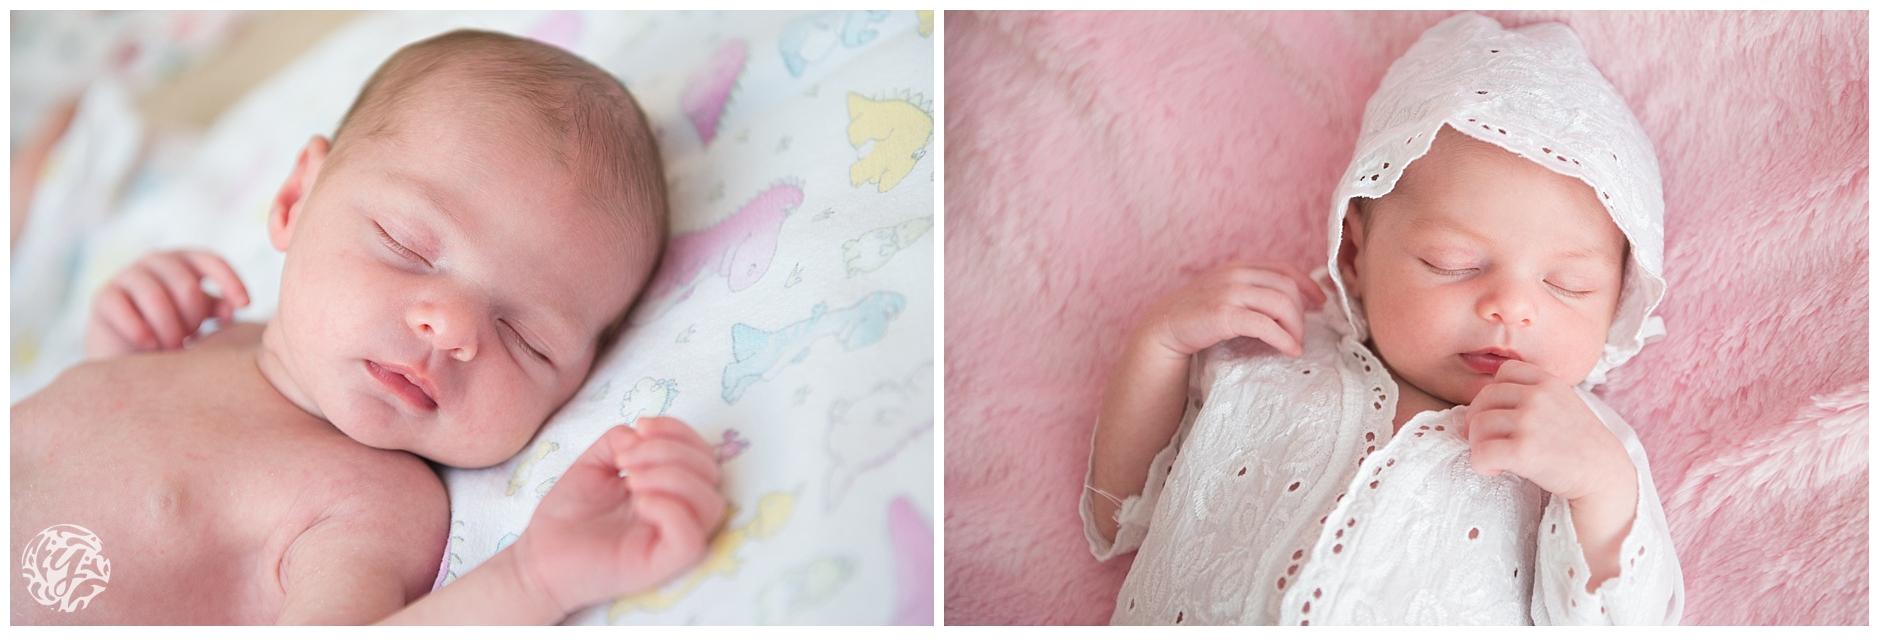 15-Ava Elizabeth-Newborn Photos-52.jpg